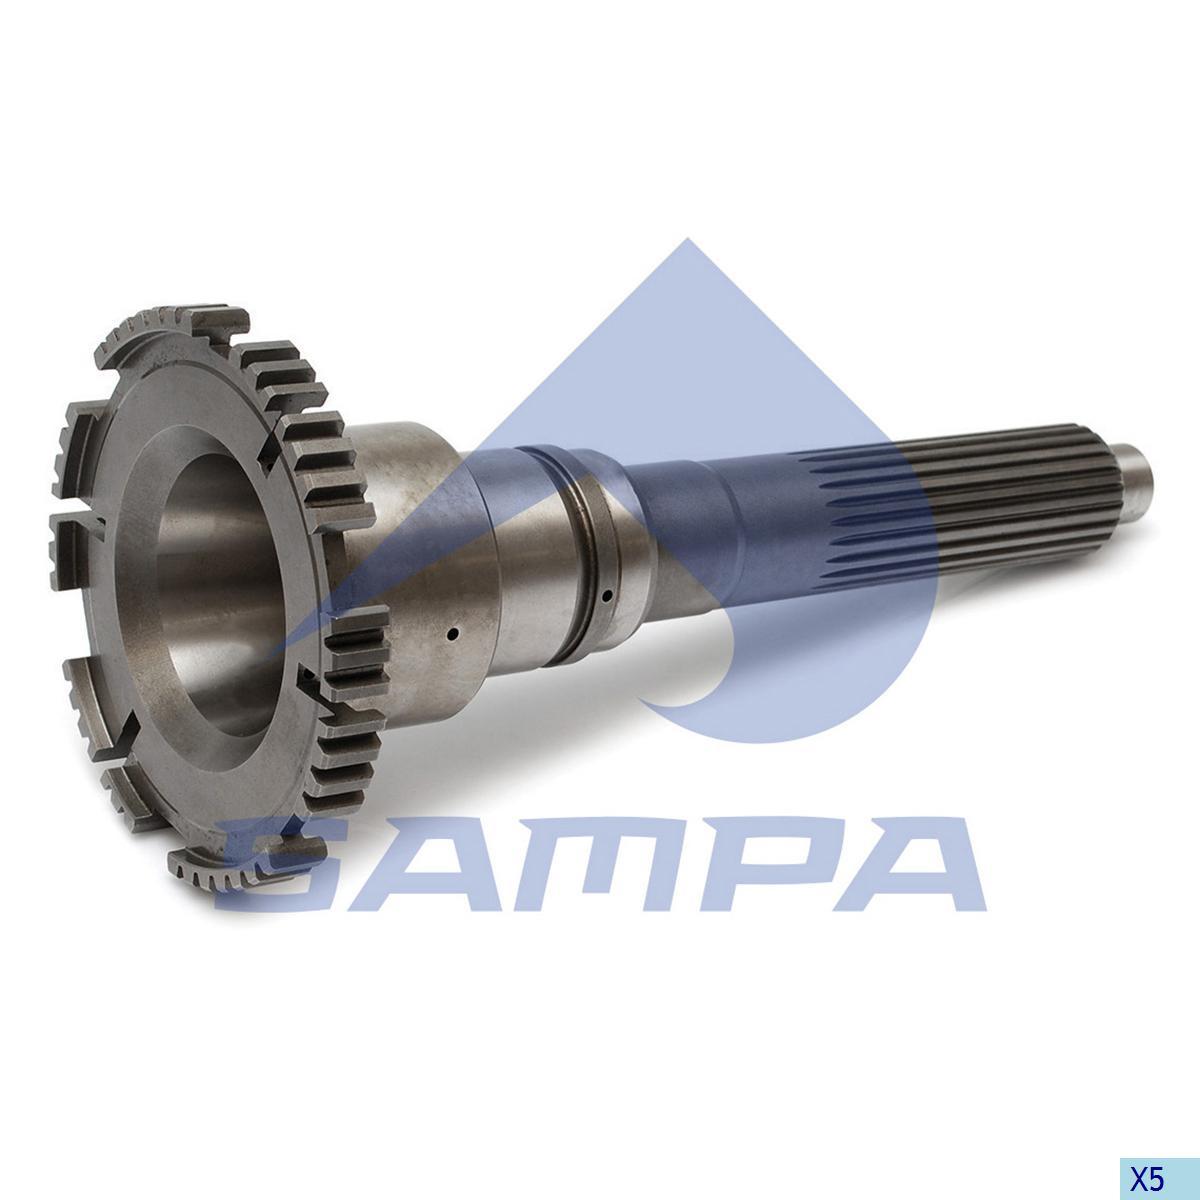 Input Shaft, Volvo, Gear Box